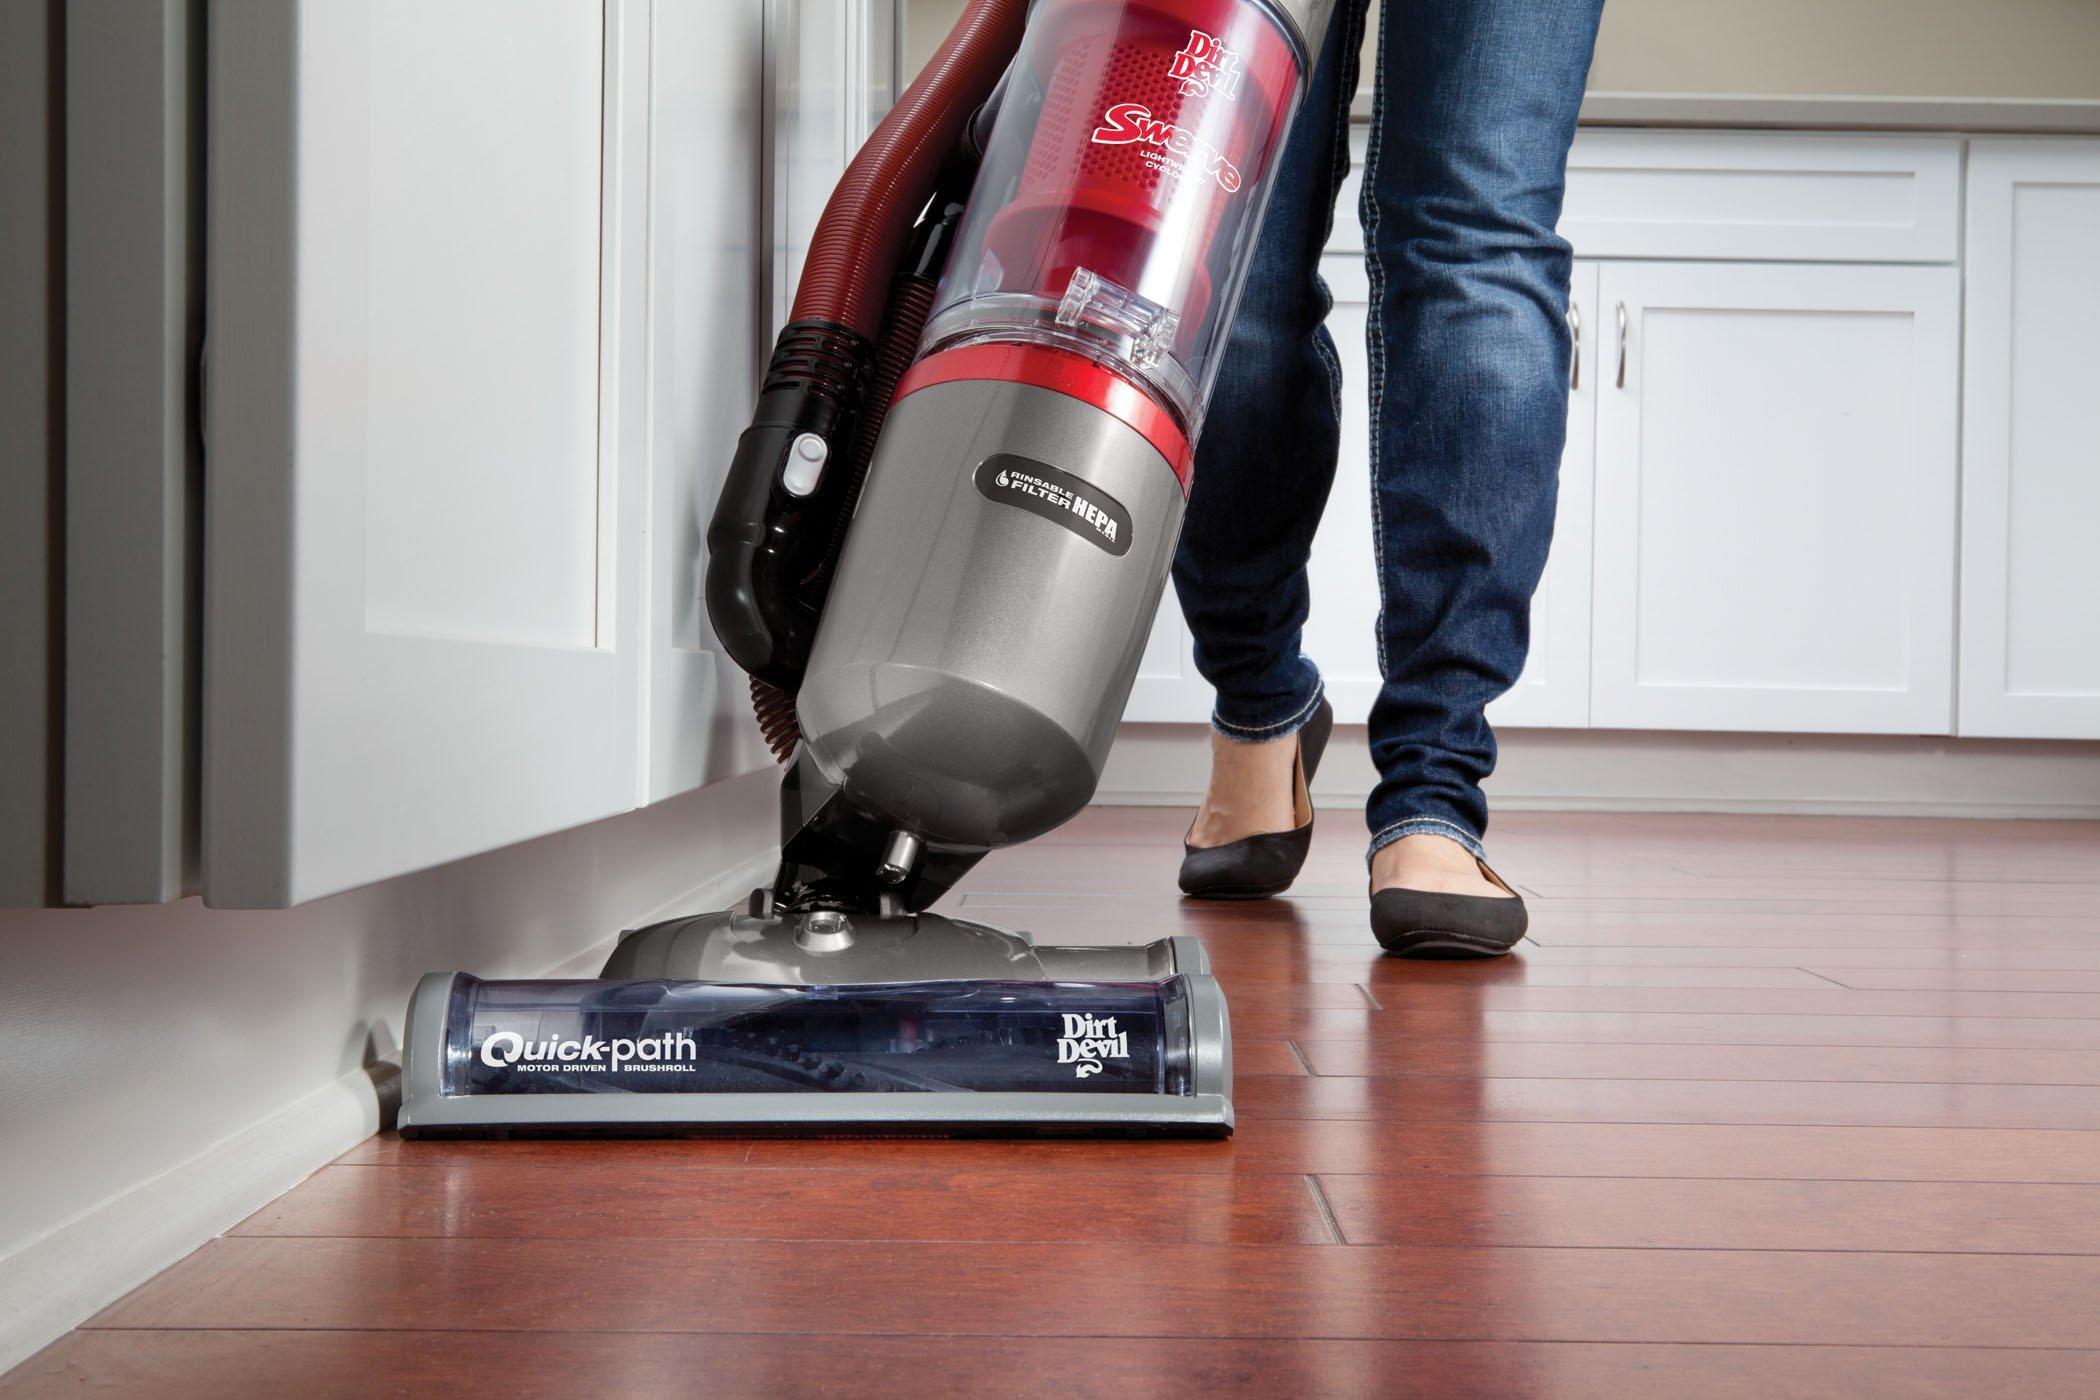 Swerve Lightweight Cyclonic Upright Vacuum3